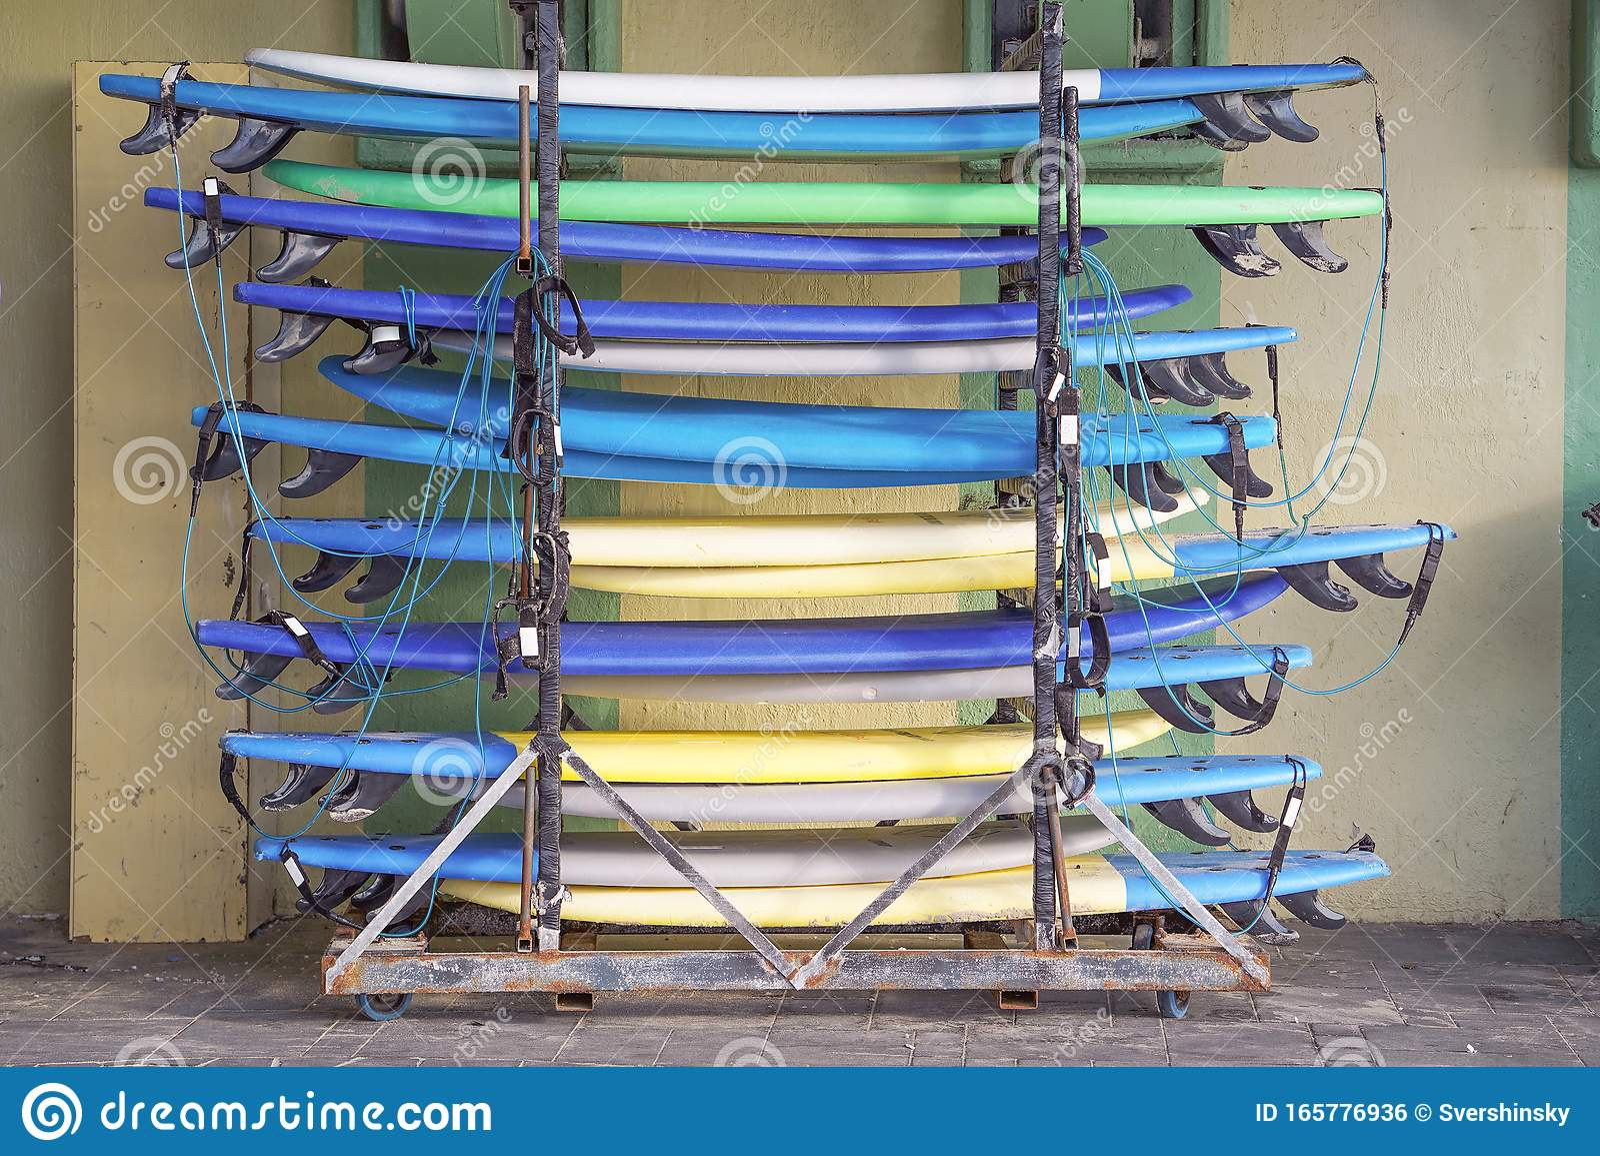 https www dreamstime com surfboards surf school equipment beach outdoor mobile stand windsurfing beginners professional rack image165776936